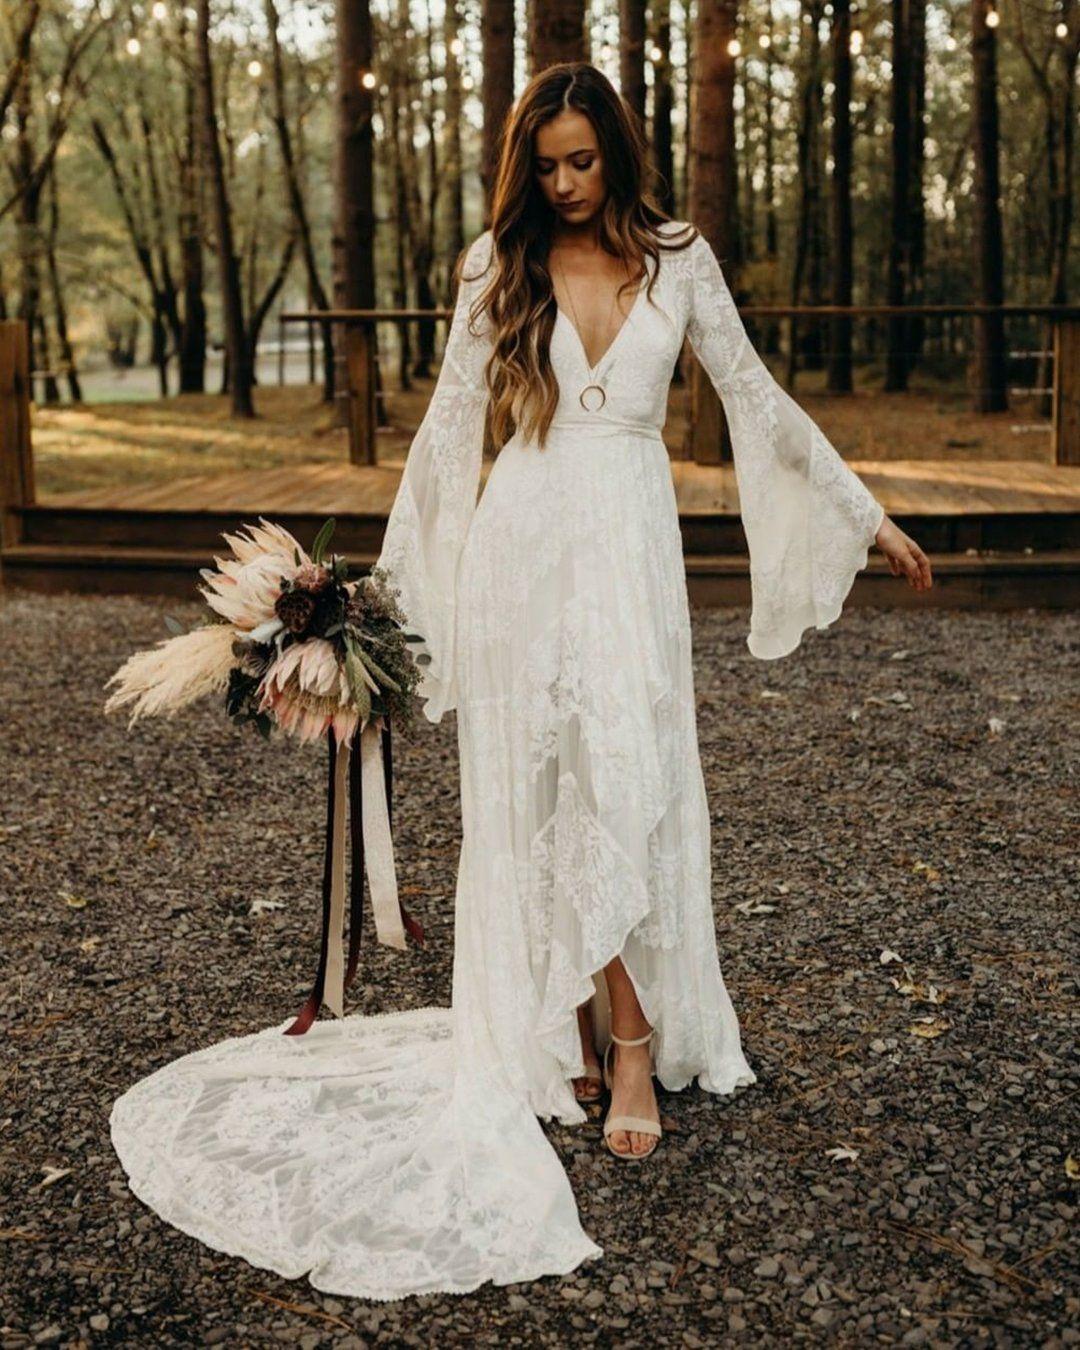 30 Boho Wedding Dresses Of Your Dream Wedding Dresses Lace Wedding Dress Long Sleeve Wedding Dresses [ 1350 x 1080 Pixel ]